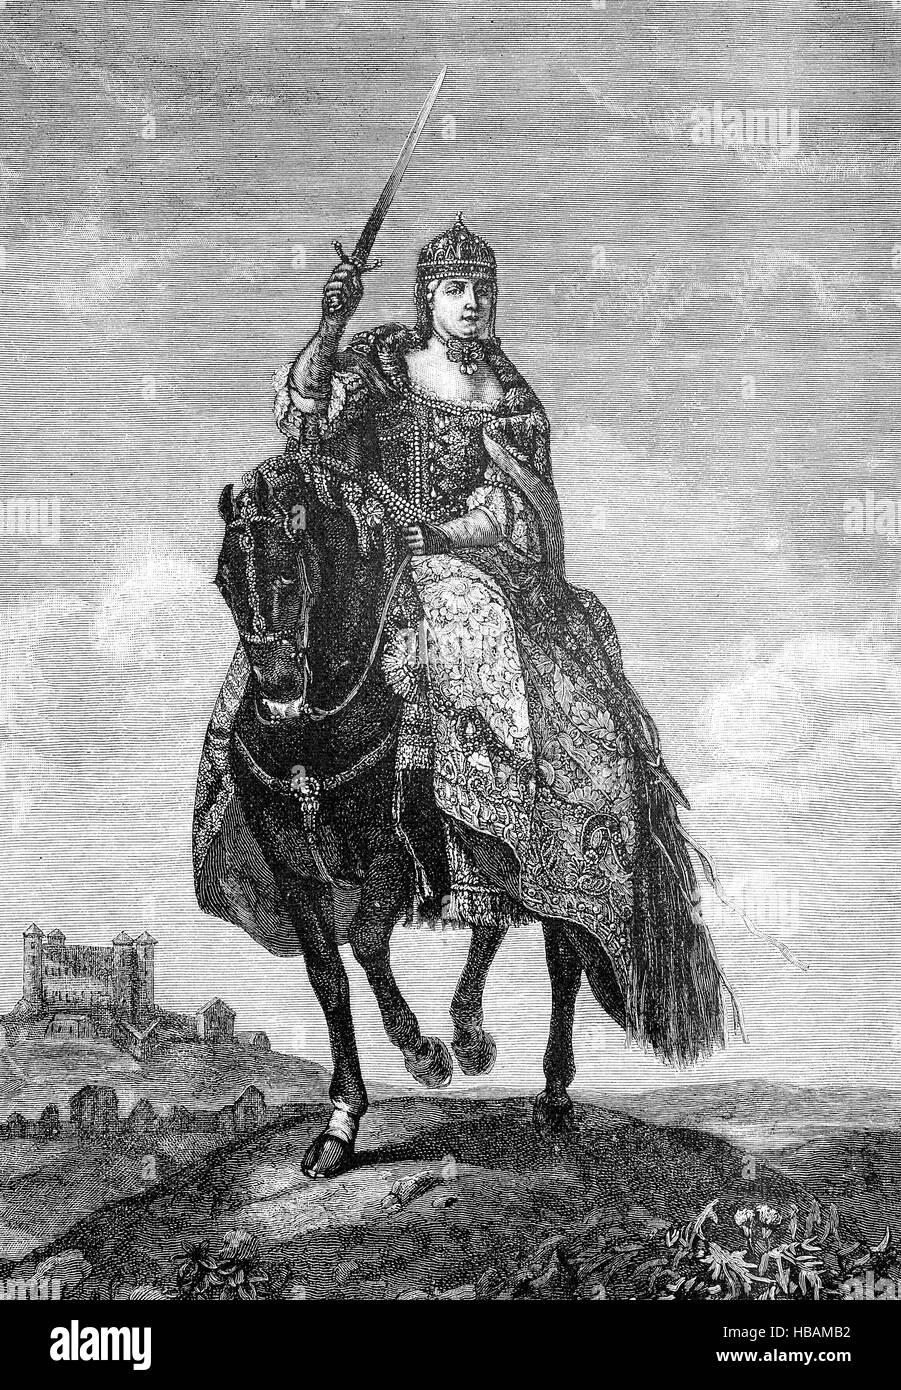 Maria Theresa Walburga Amalia Christina, Maria Theresia , 13 May 1717 - 29 November 1780, was the only female ruler - Stock Image